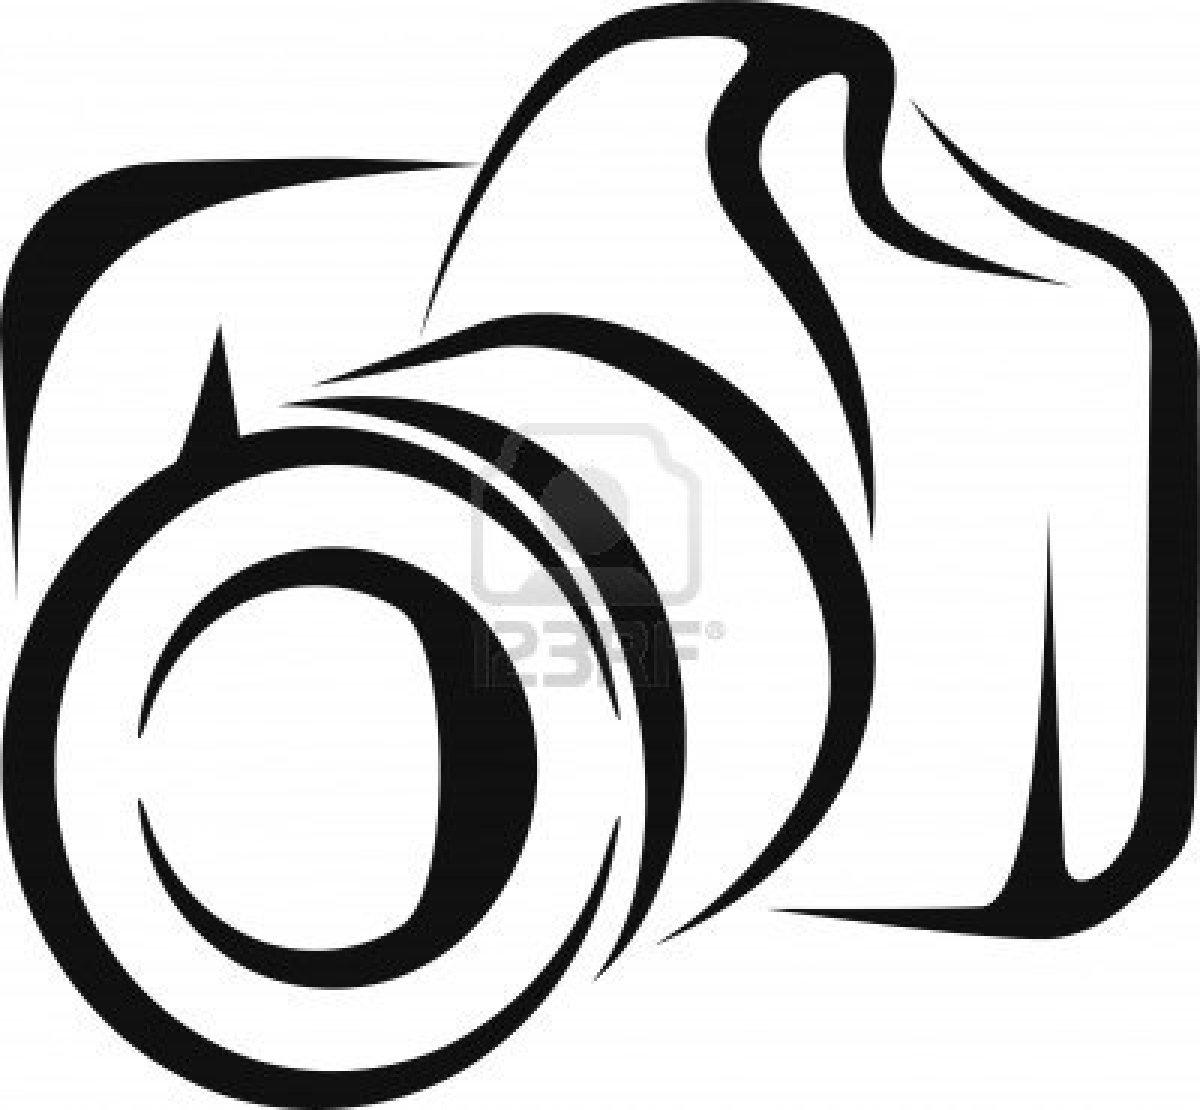 1200x1110 Nobby Camera Clip Art For Logo 35674